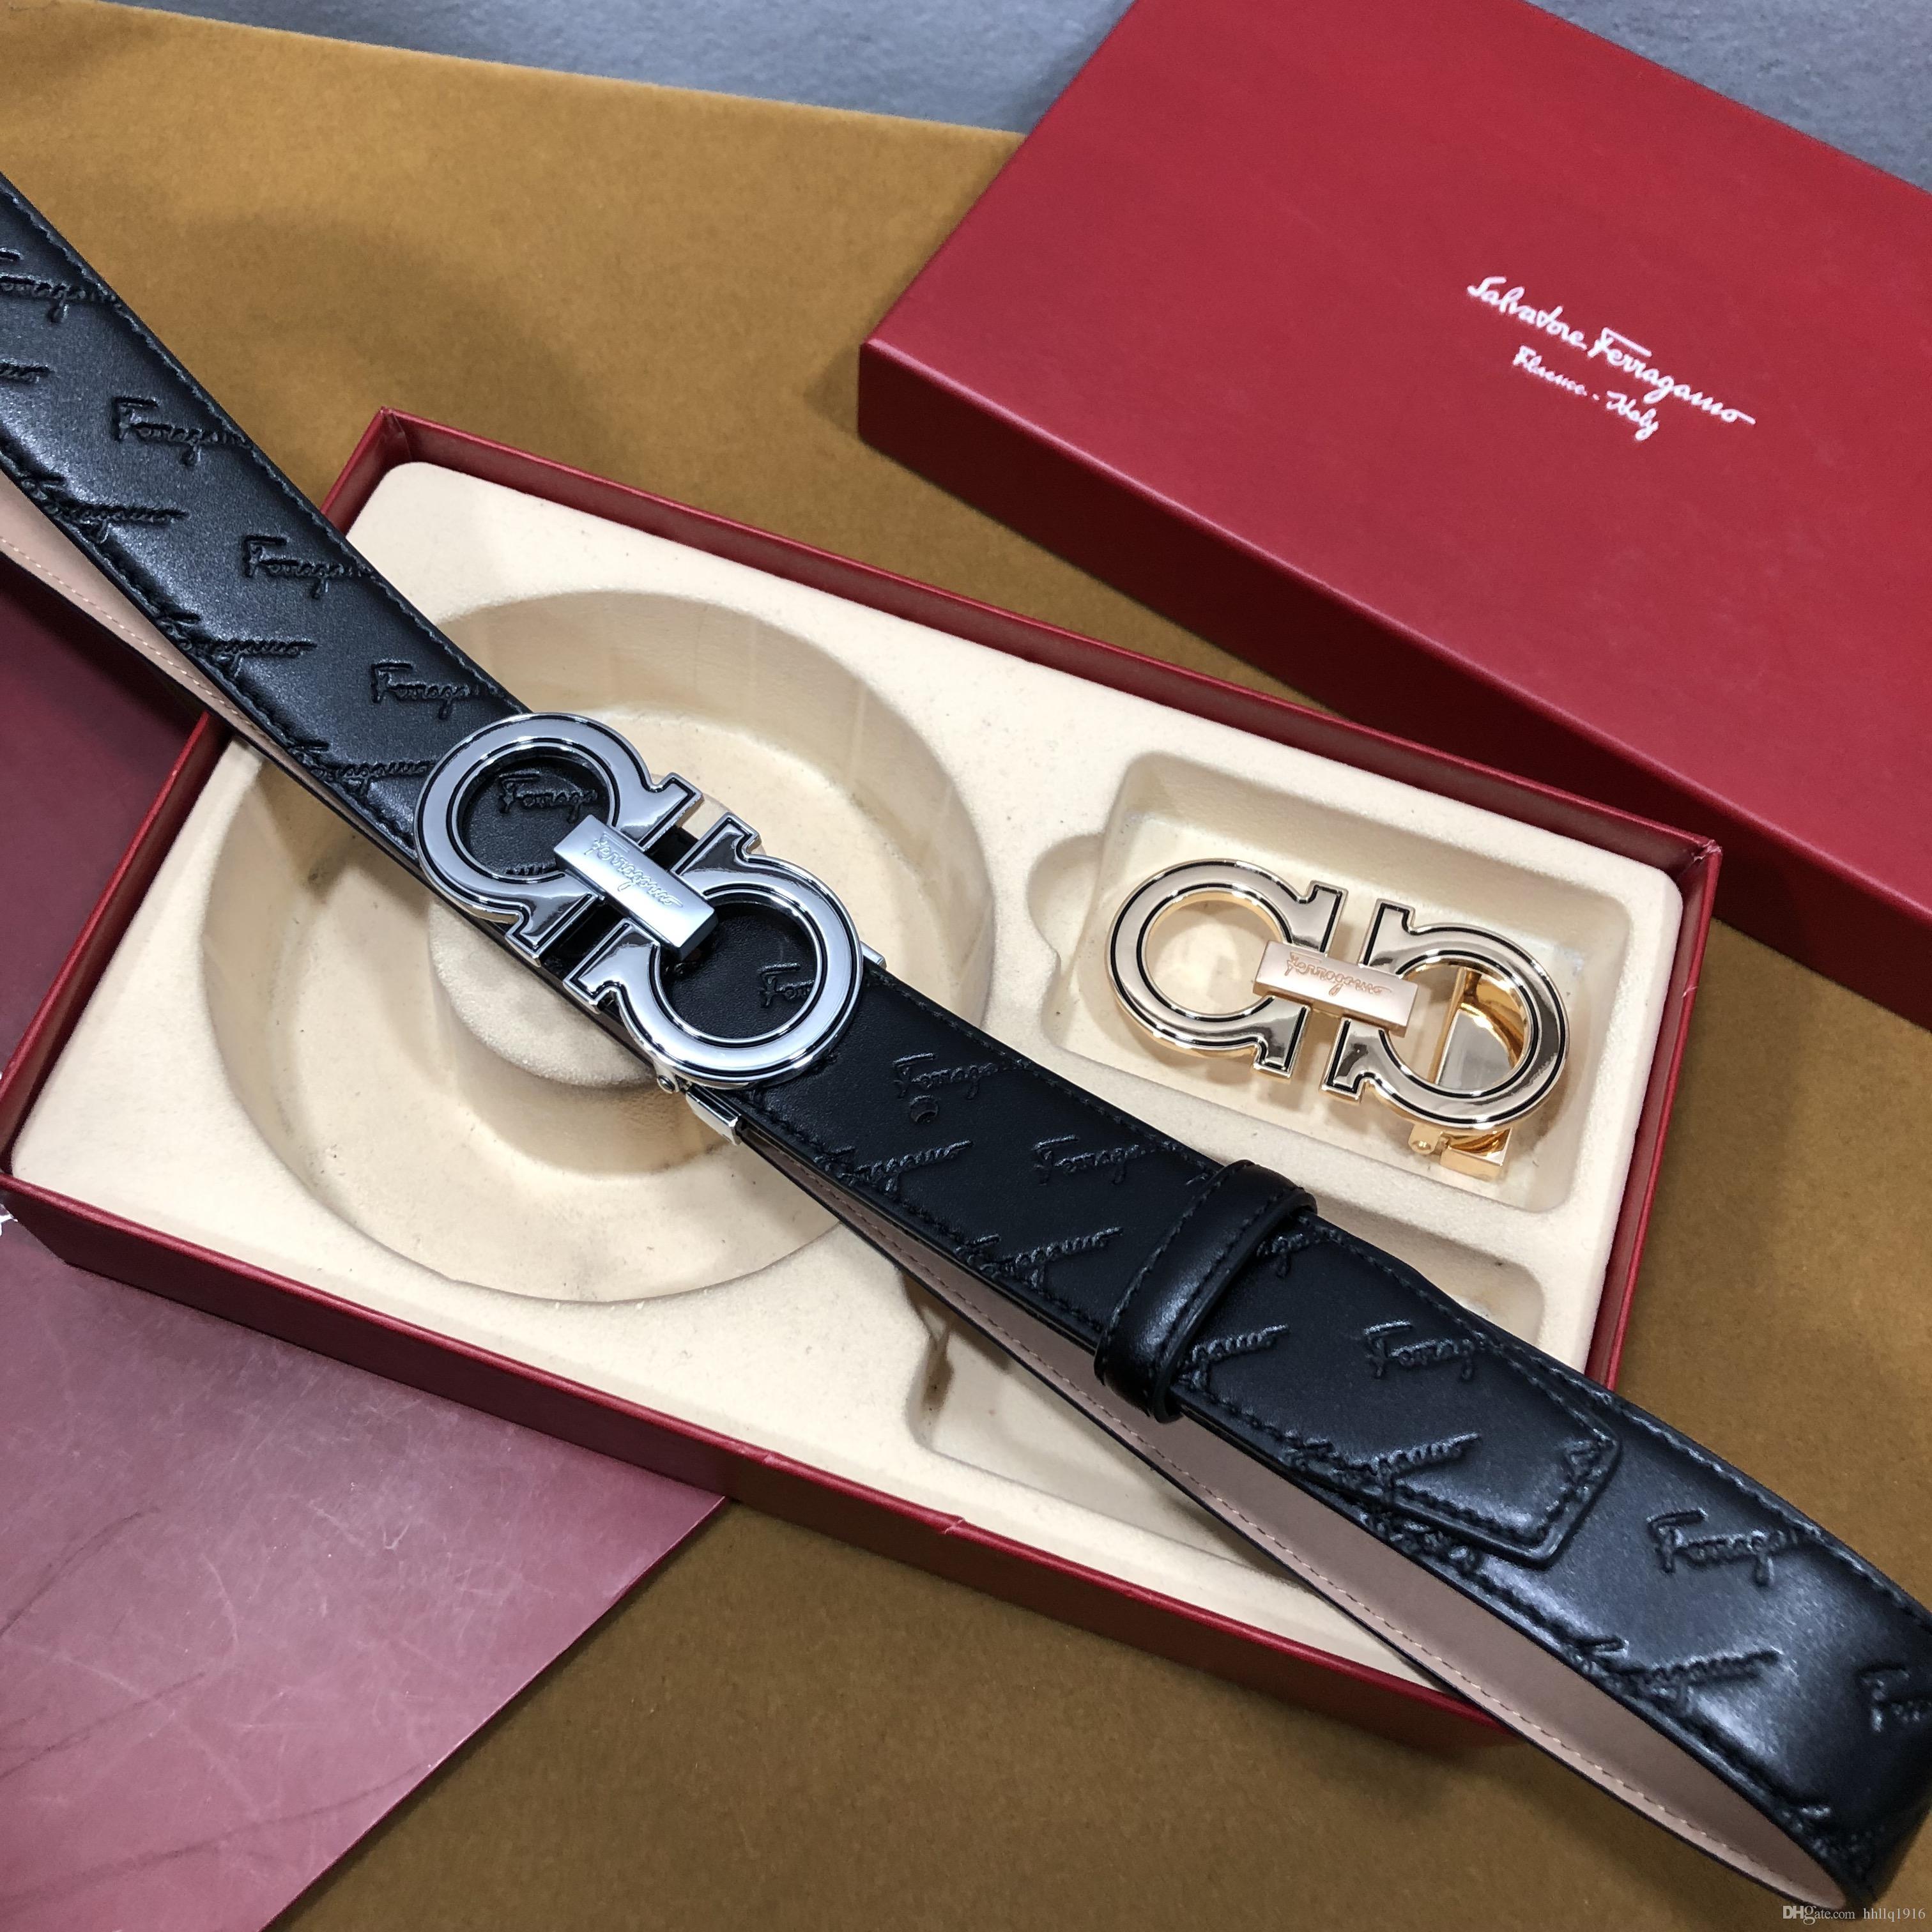 How To Tell If A Ferragamo Belt Is Real >> Hot Sell Ferragamo Belt Men Business Belts Genuine Belts Designer 8 Shaped Buckle Women Leather Waist Send Gift Box Two Buckle